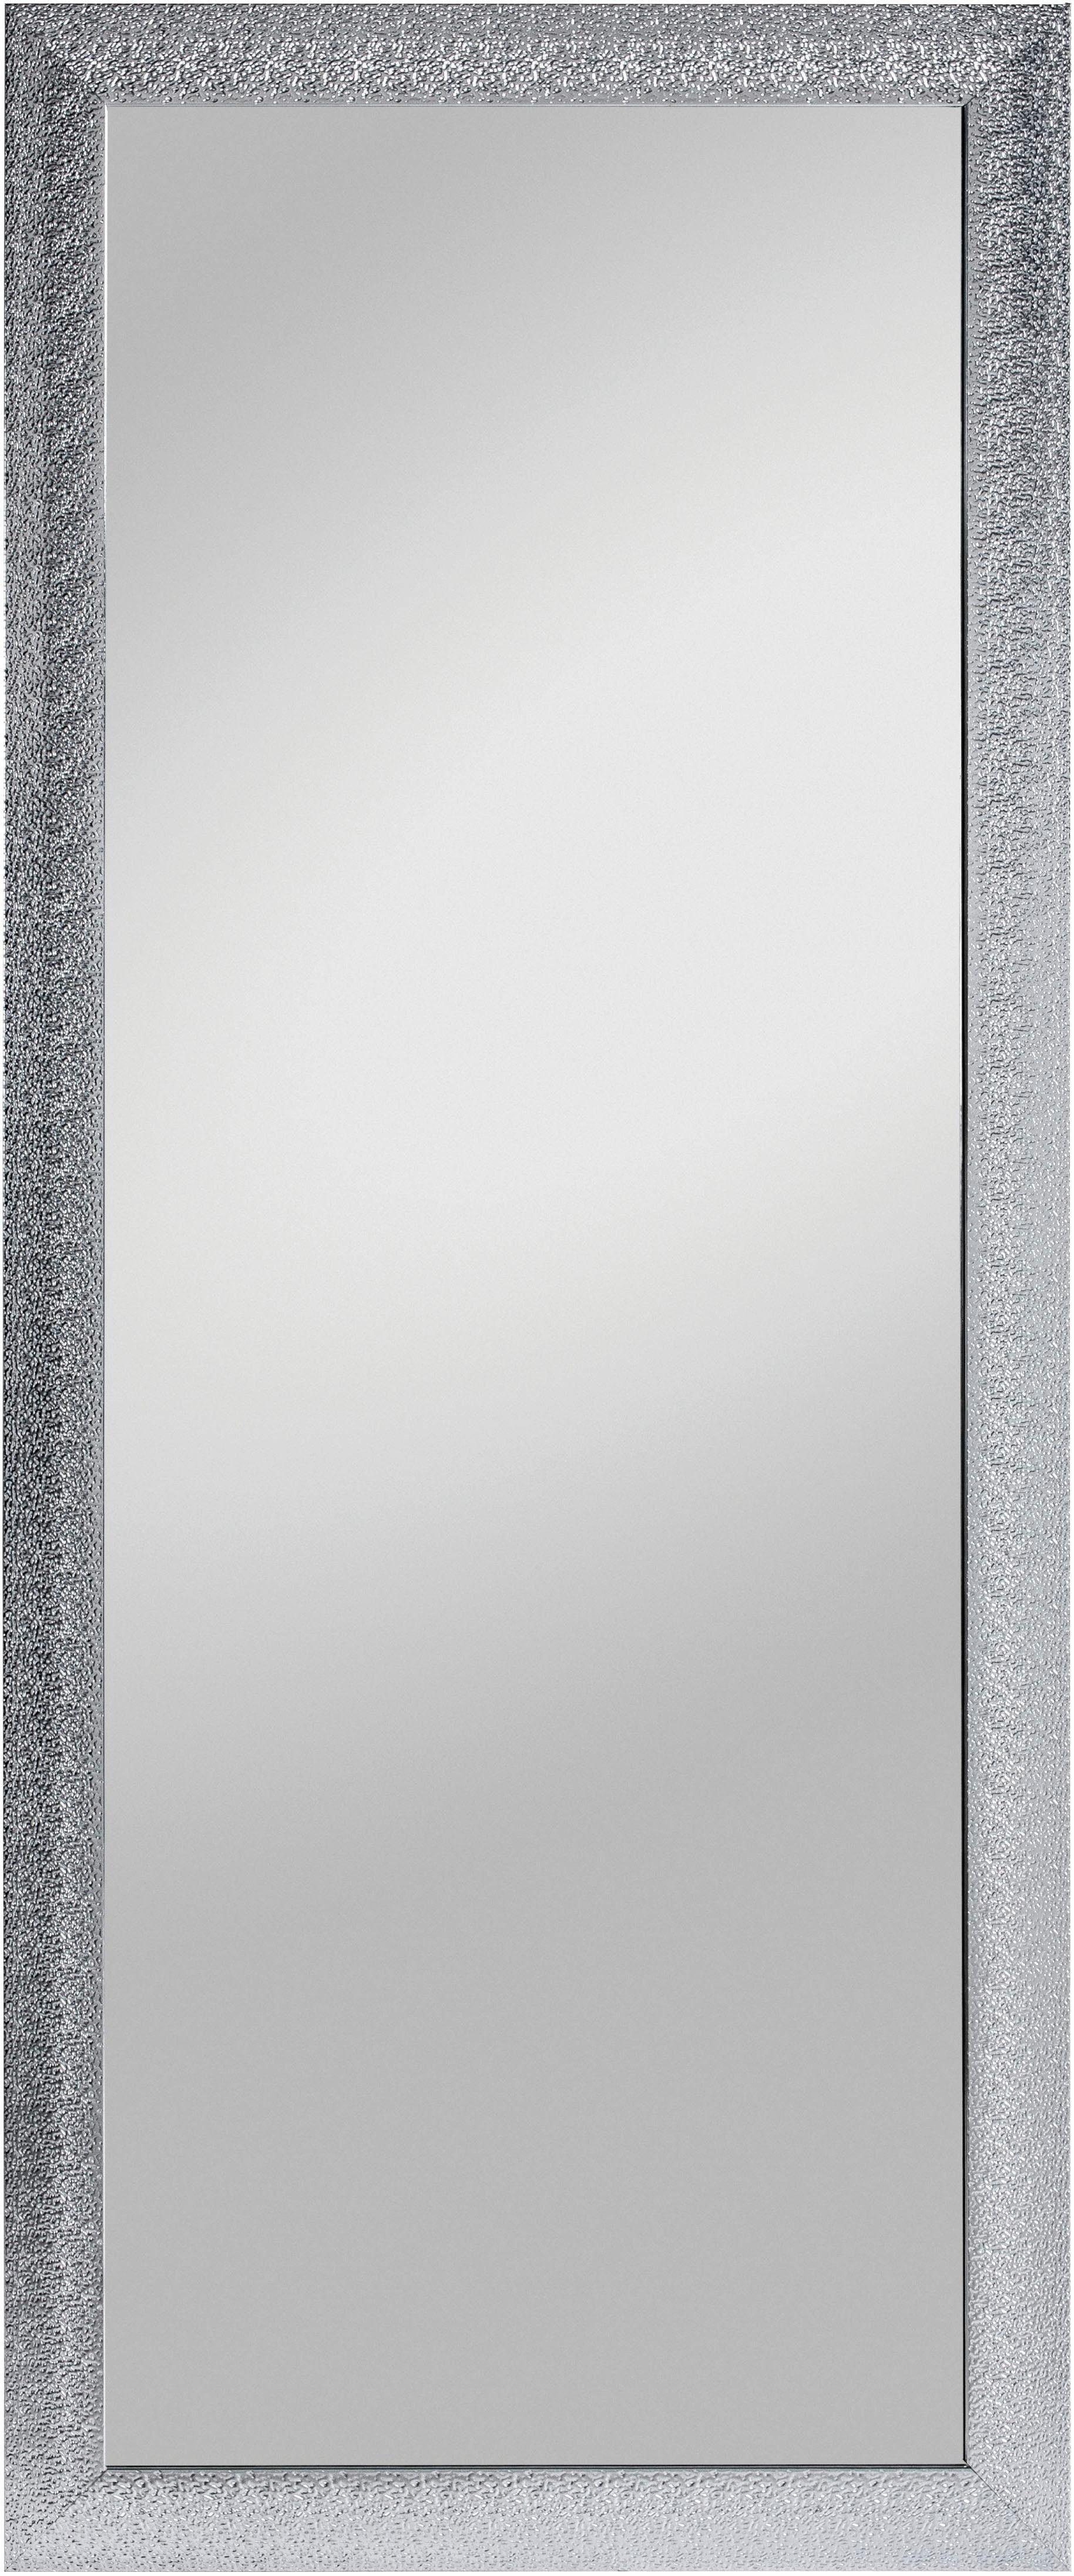 Home affaire, Spiegel, »Rosi«, 70/170 cm